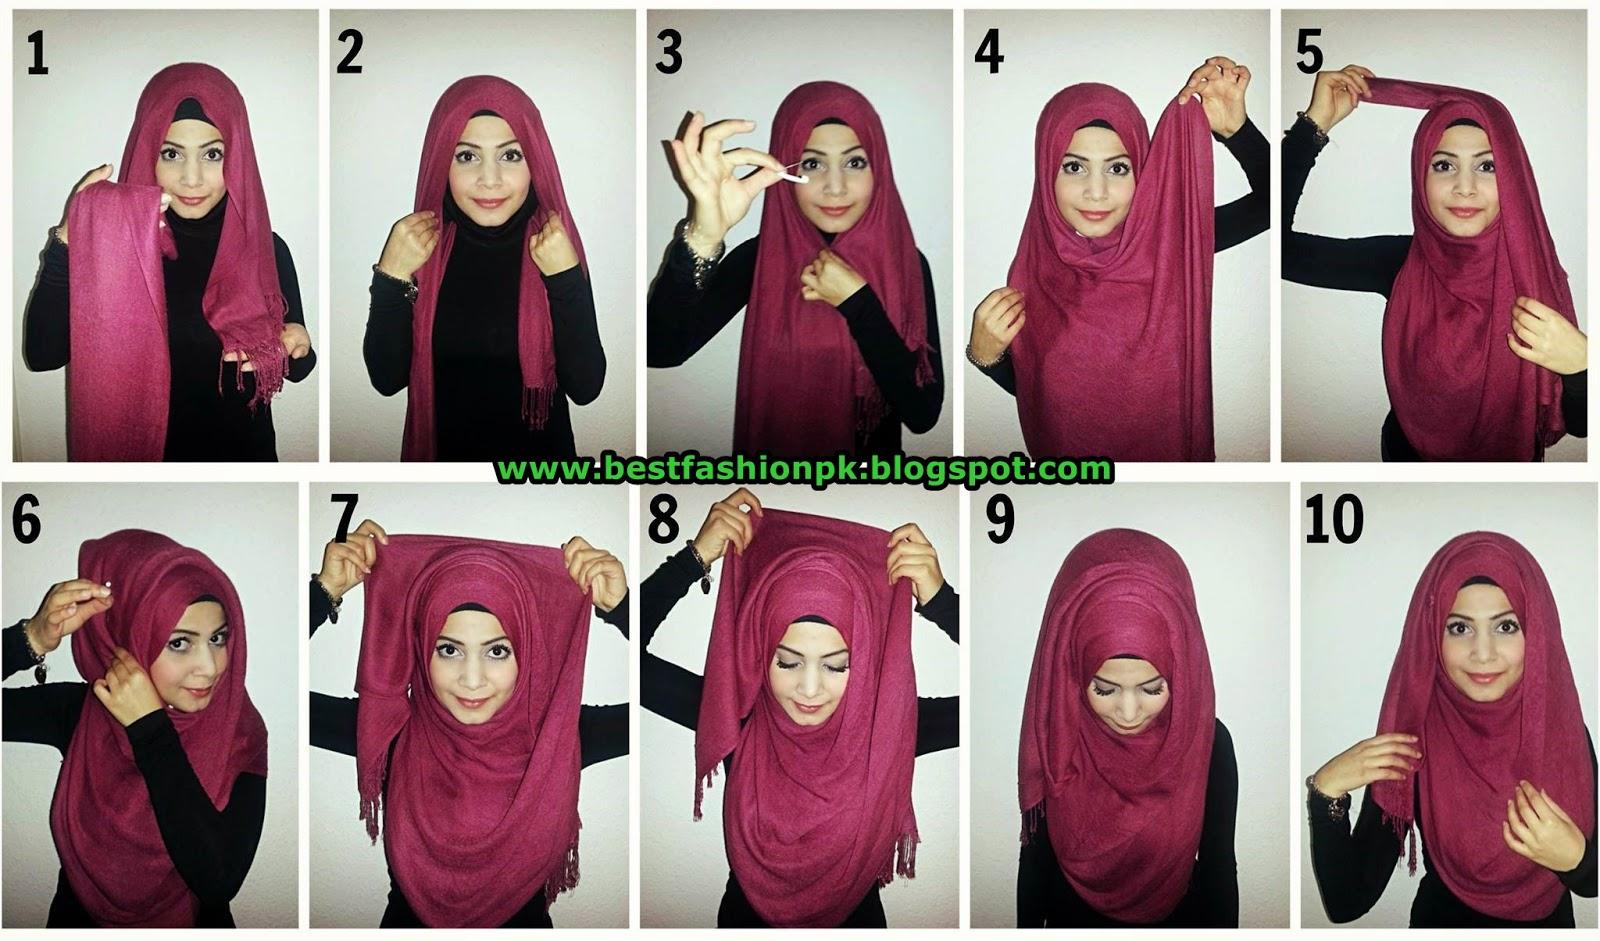 Modern and beautiful hijab styles tutorial fashion collections girls and women wear Fashion style hijab modern